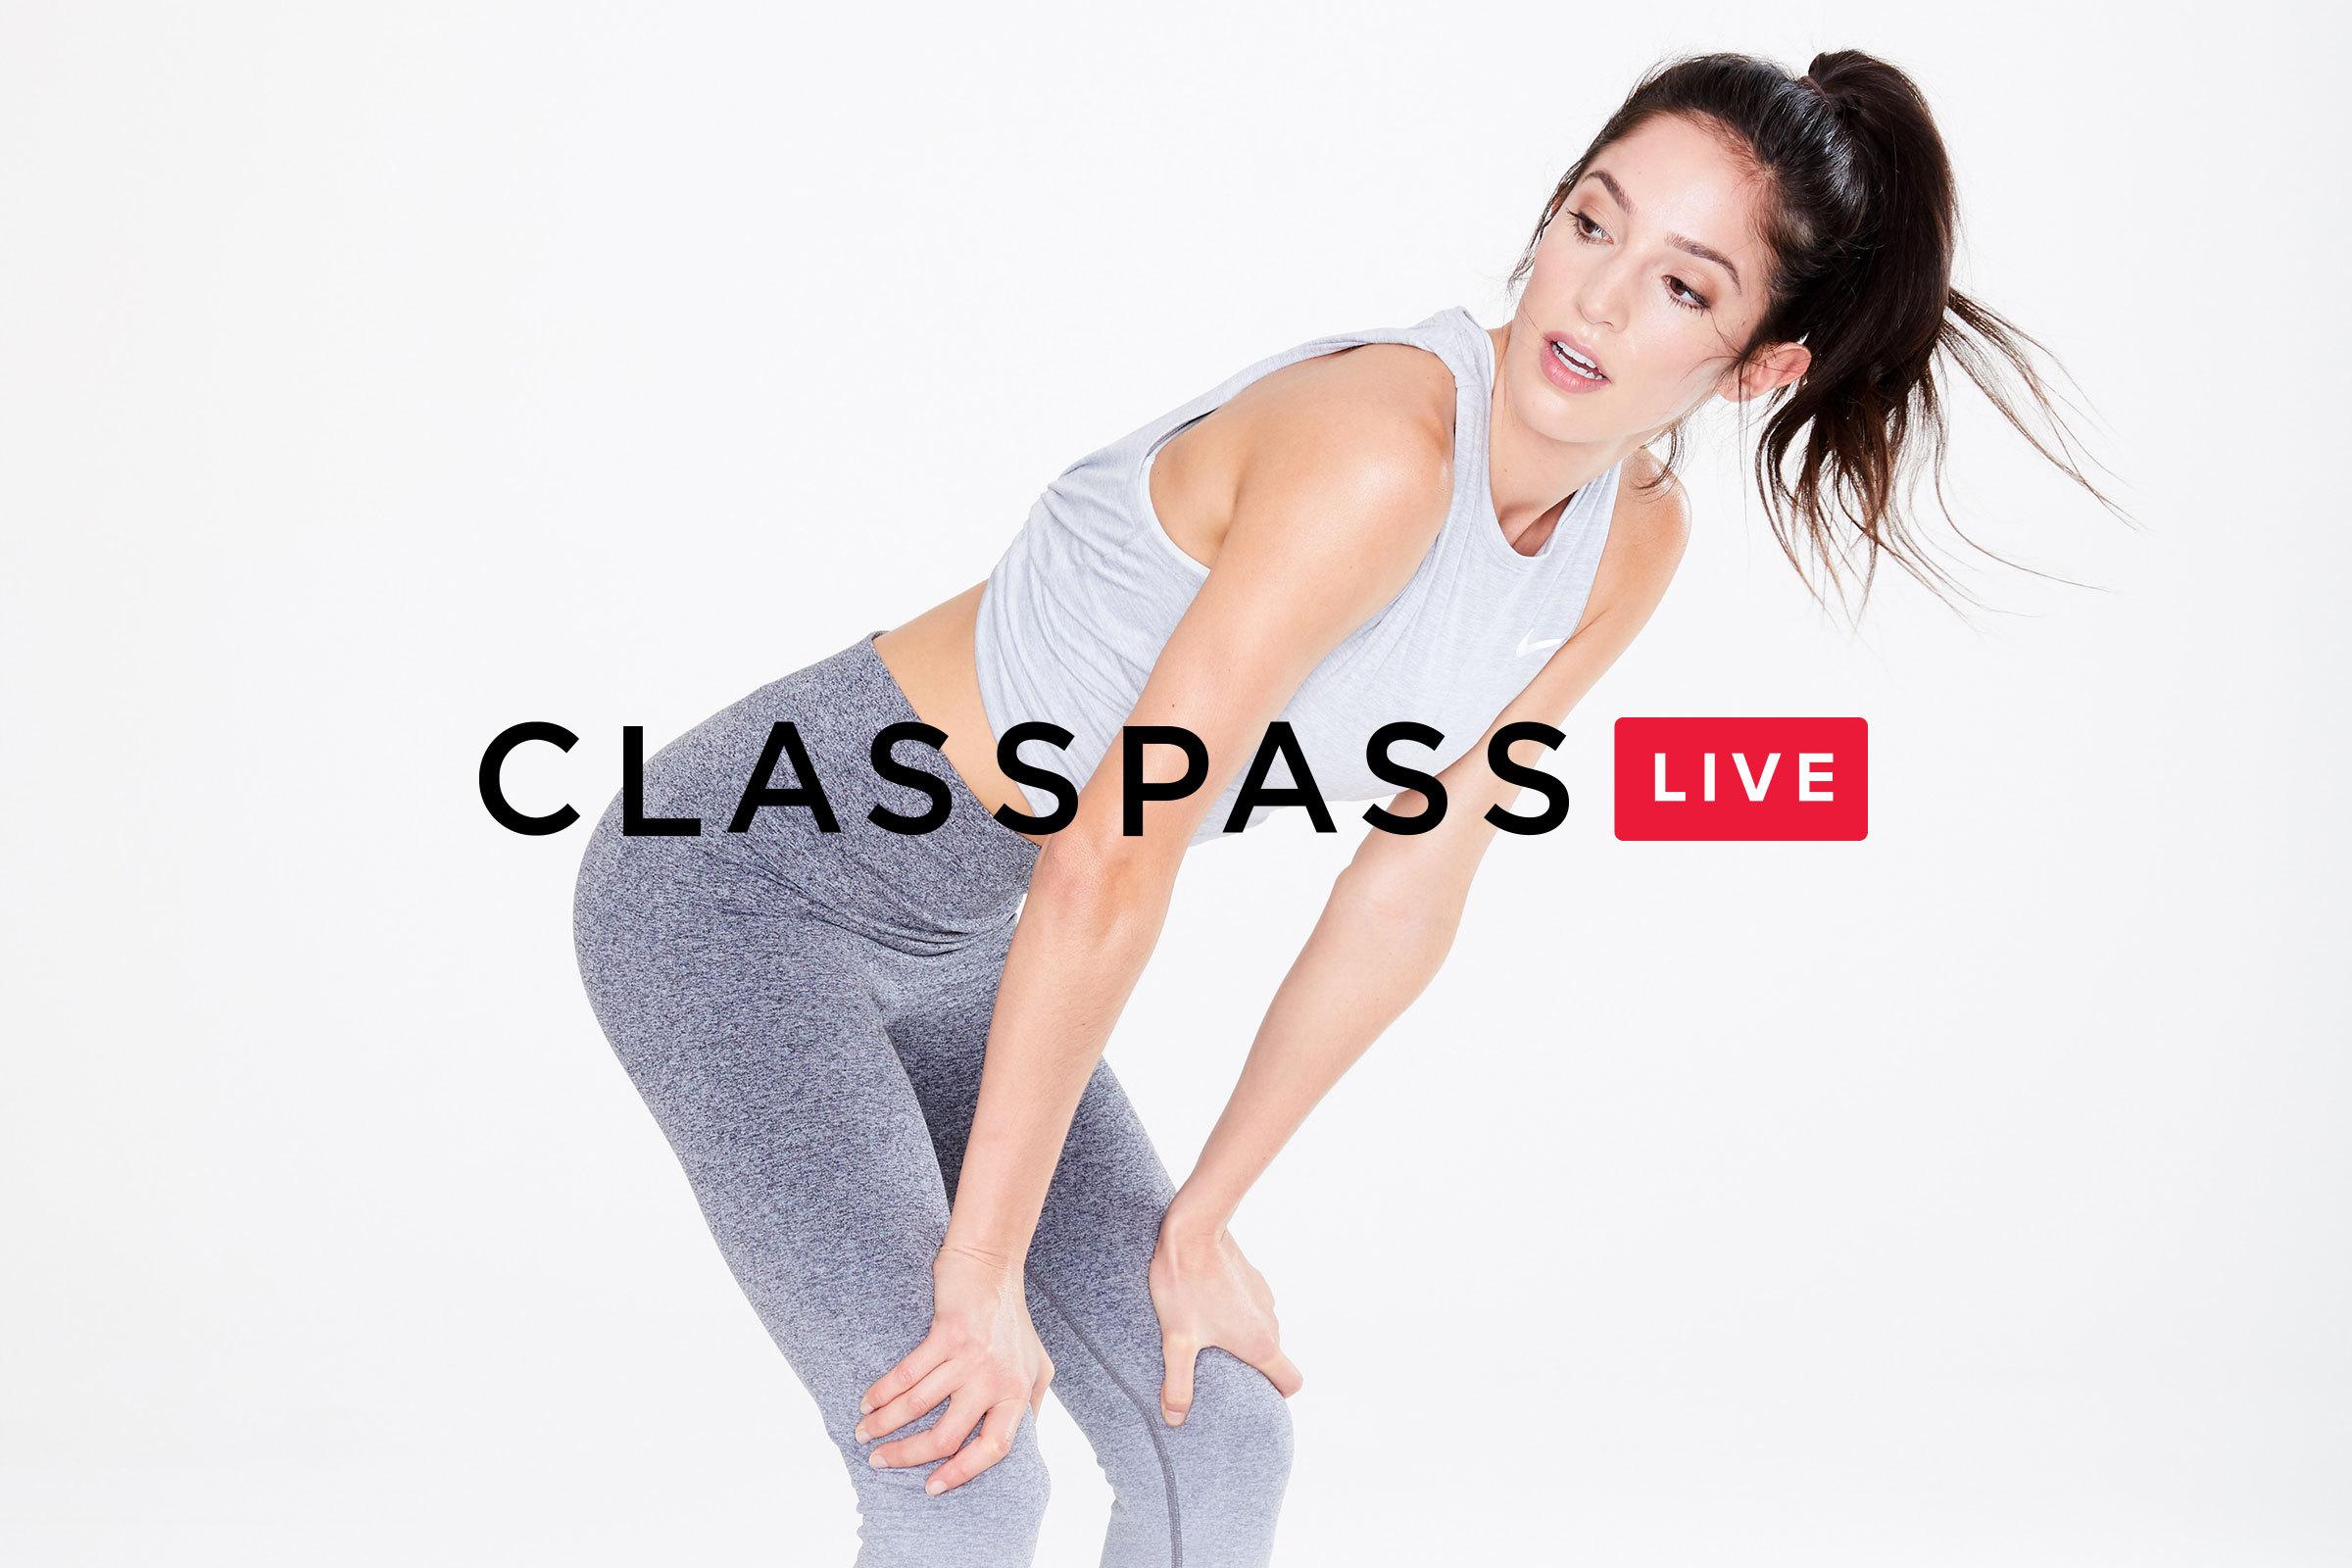 Our Classpass Live Statements